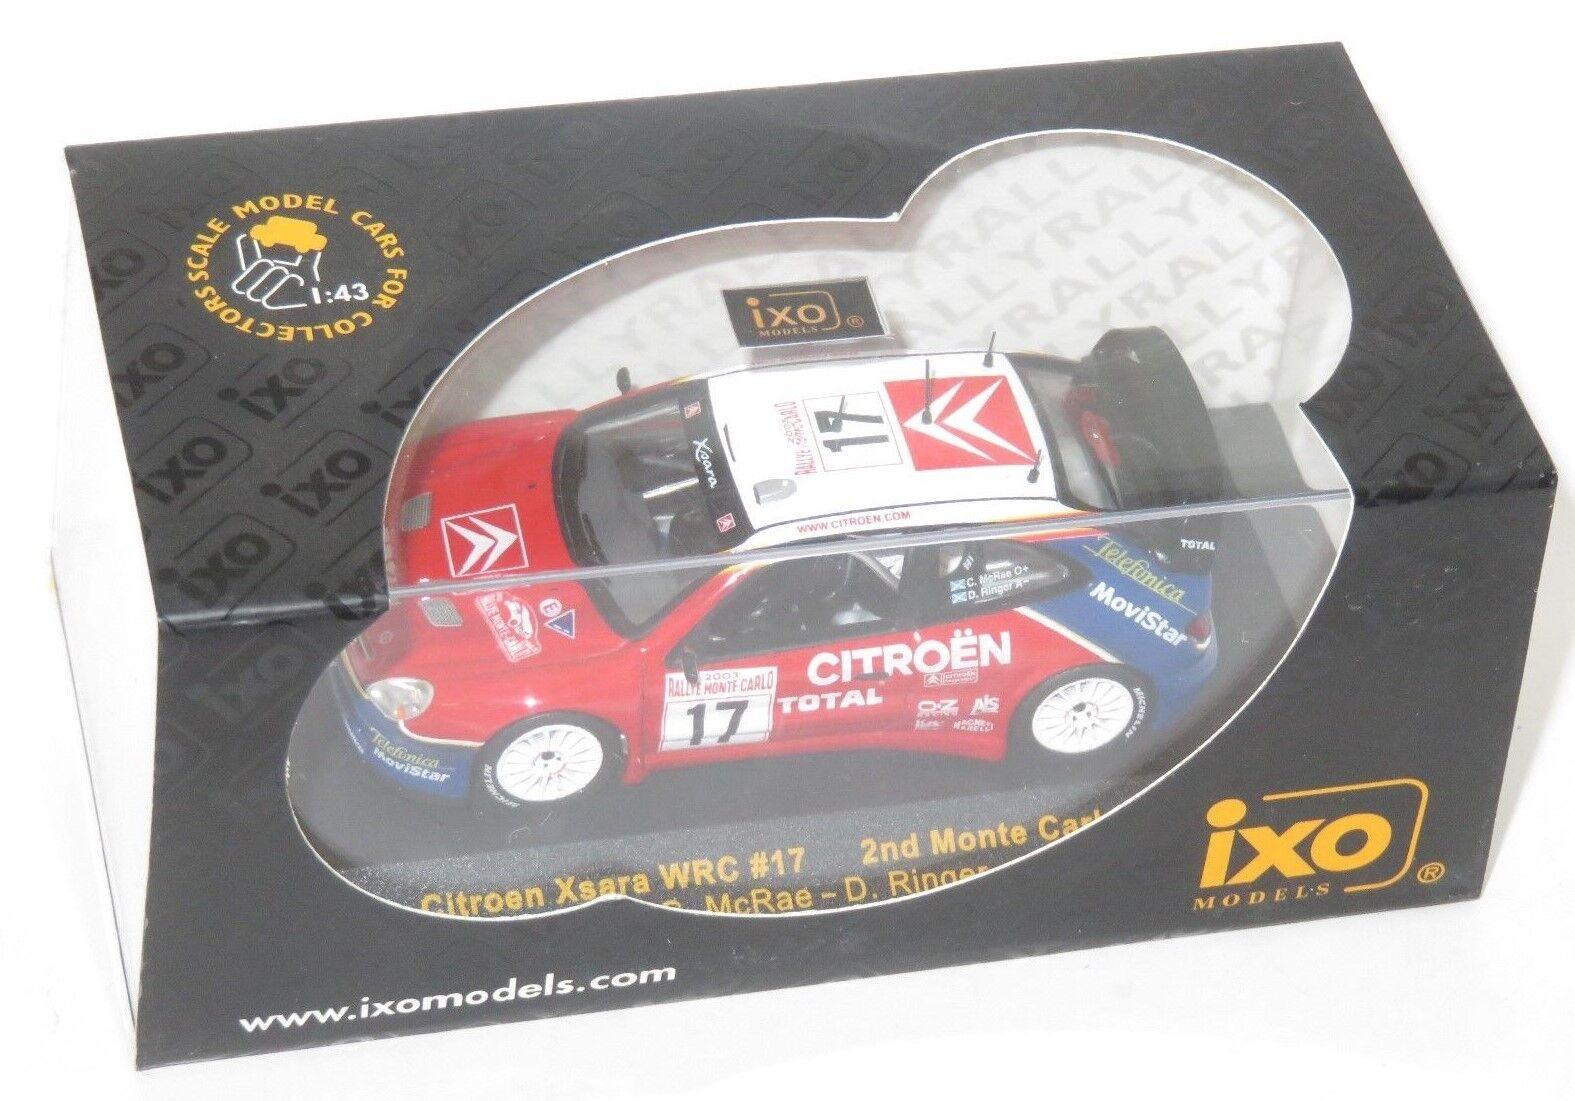 1/43 CITROEN XSARA WRC Totale Monte Carlo Rallye 2003 C. MCRAE